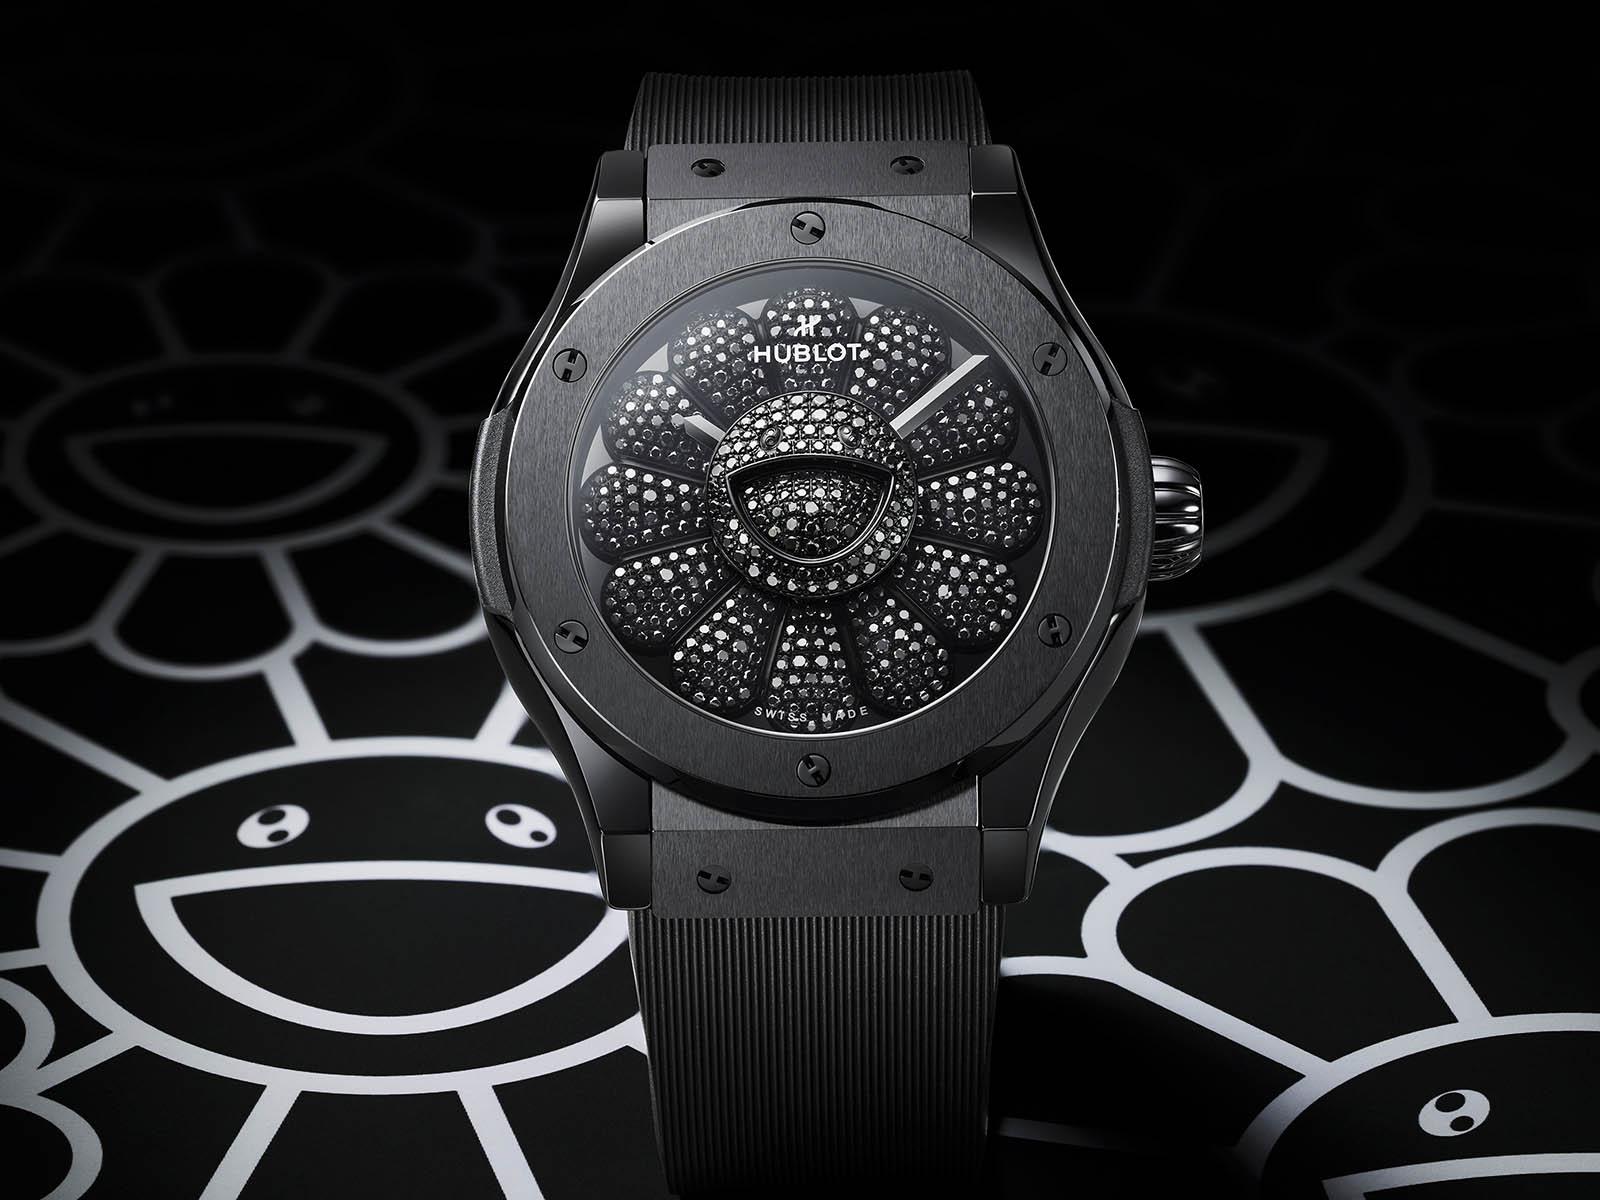 507-cx-9000-rx-tak21-hublot-classic-fusion-takashi-murakami-all-black-2.jpg